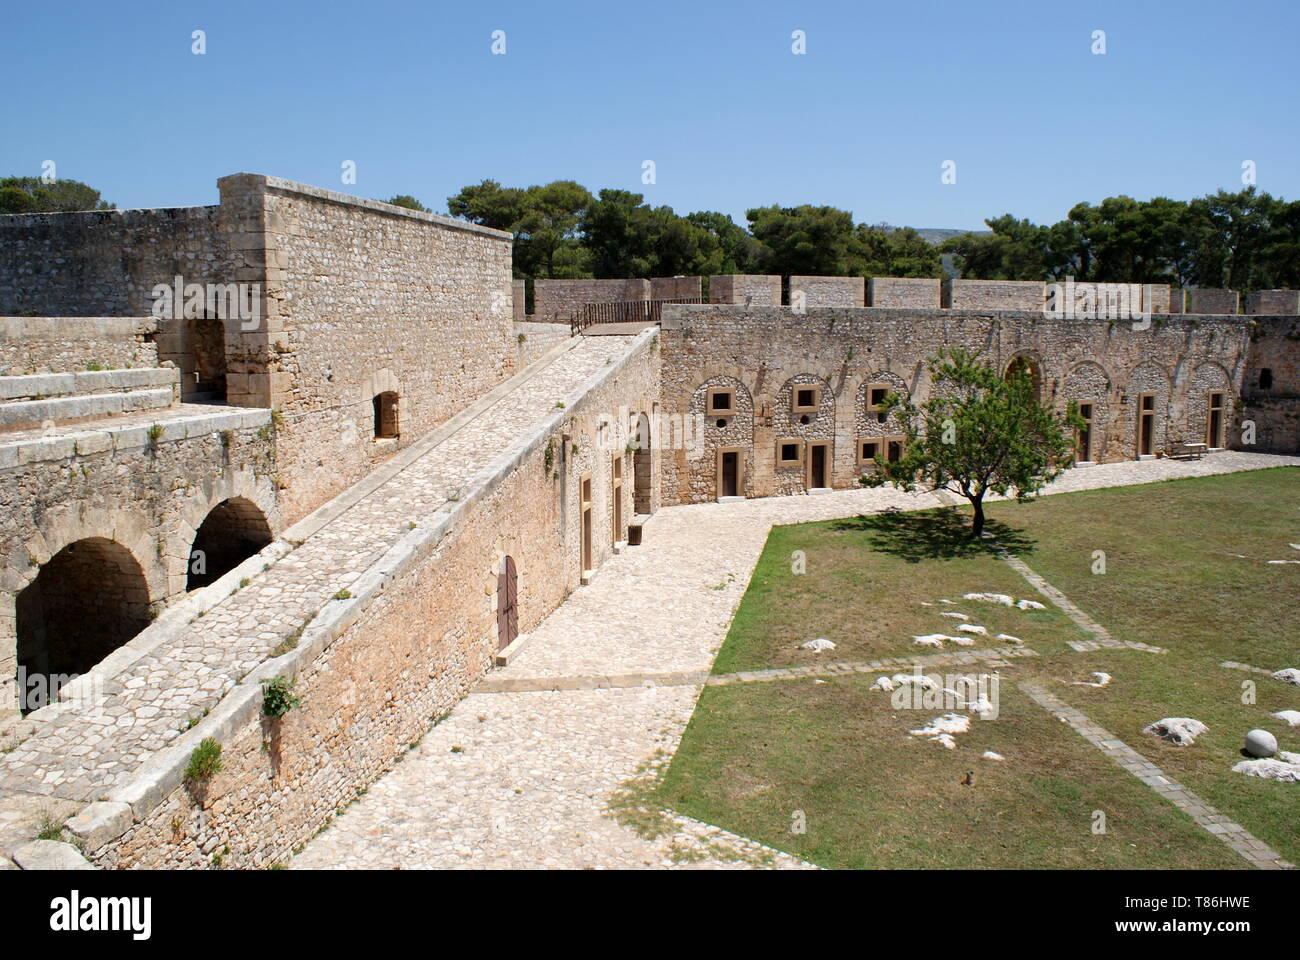 Niokastro castle, Pylos, Peloponnese, Greece - Stock Image